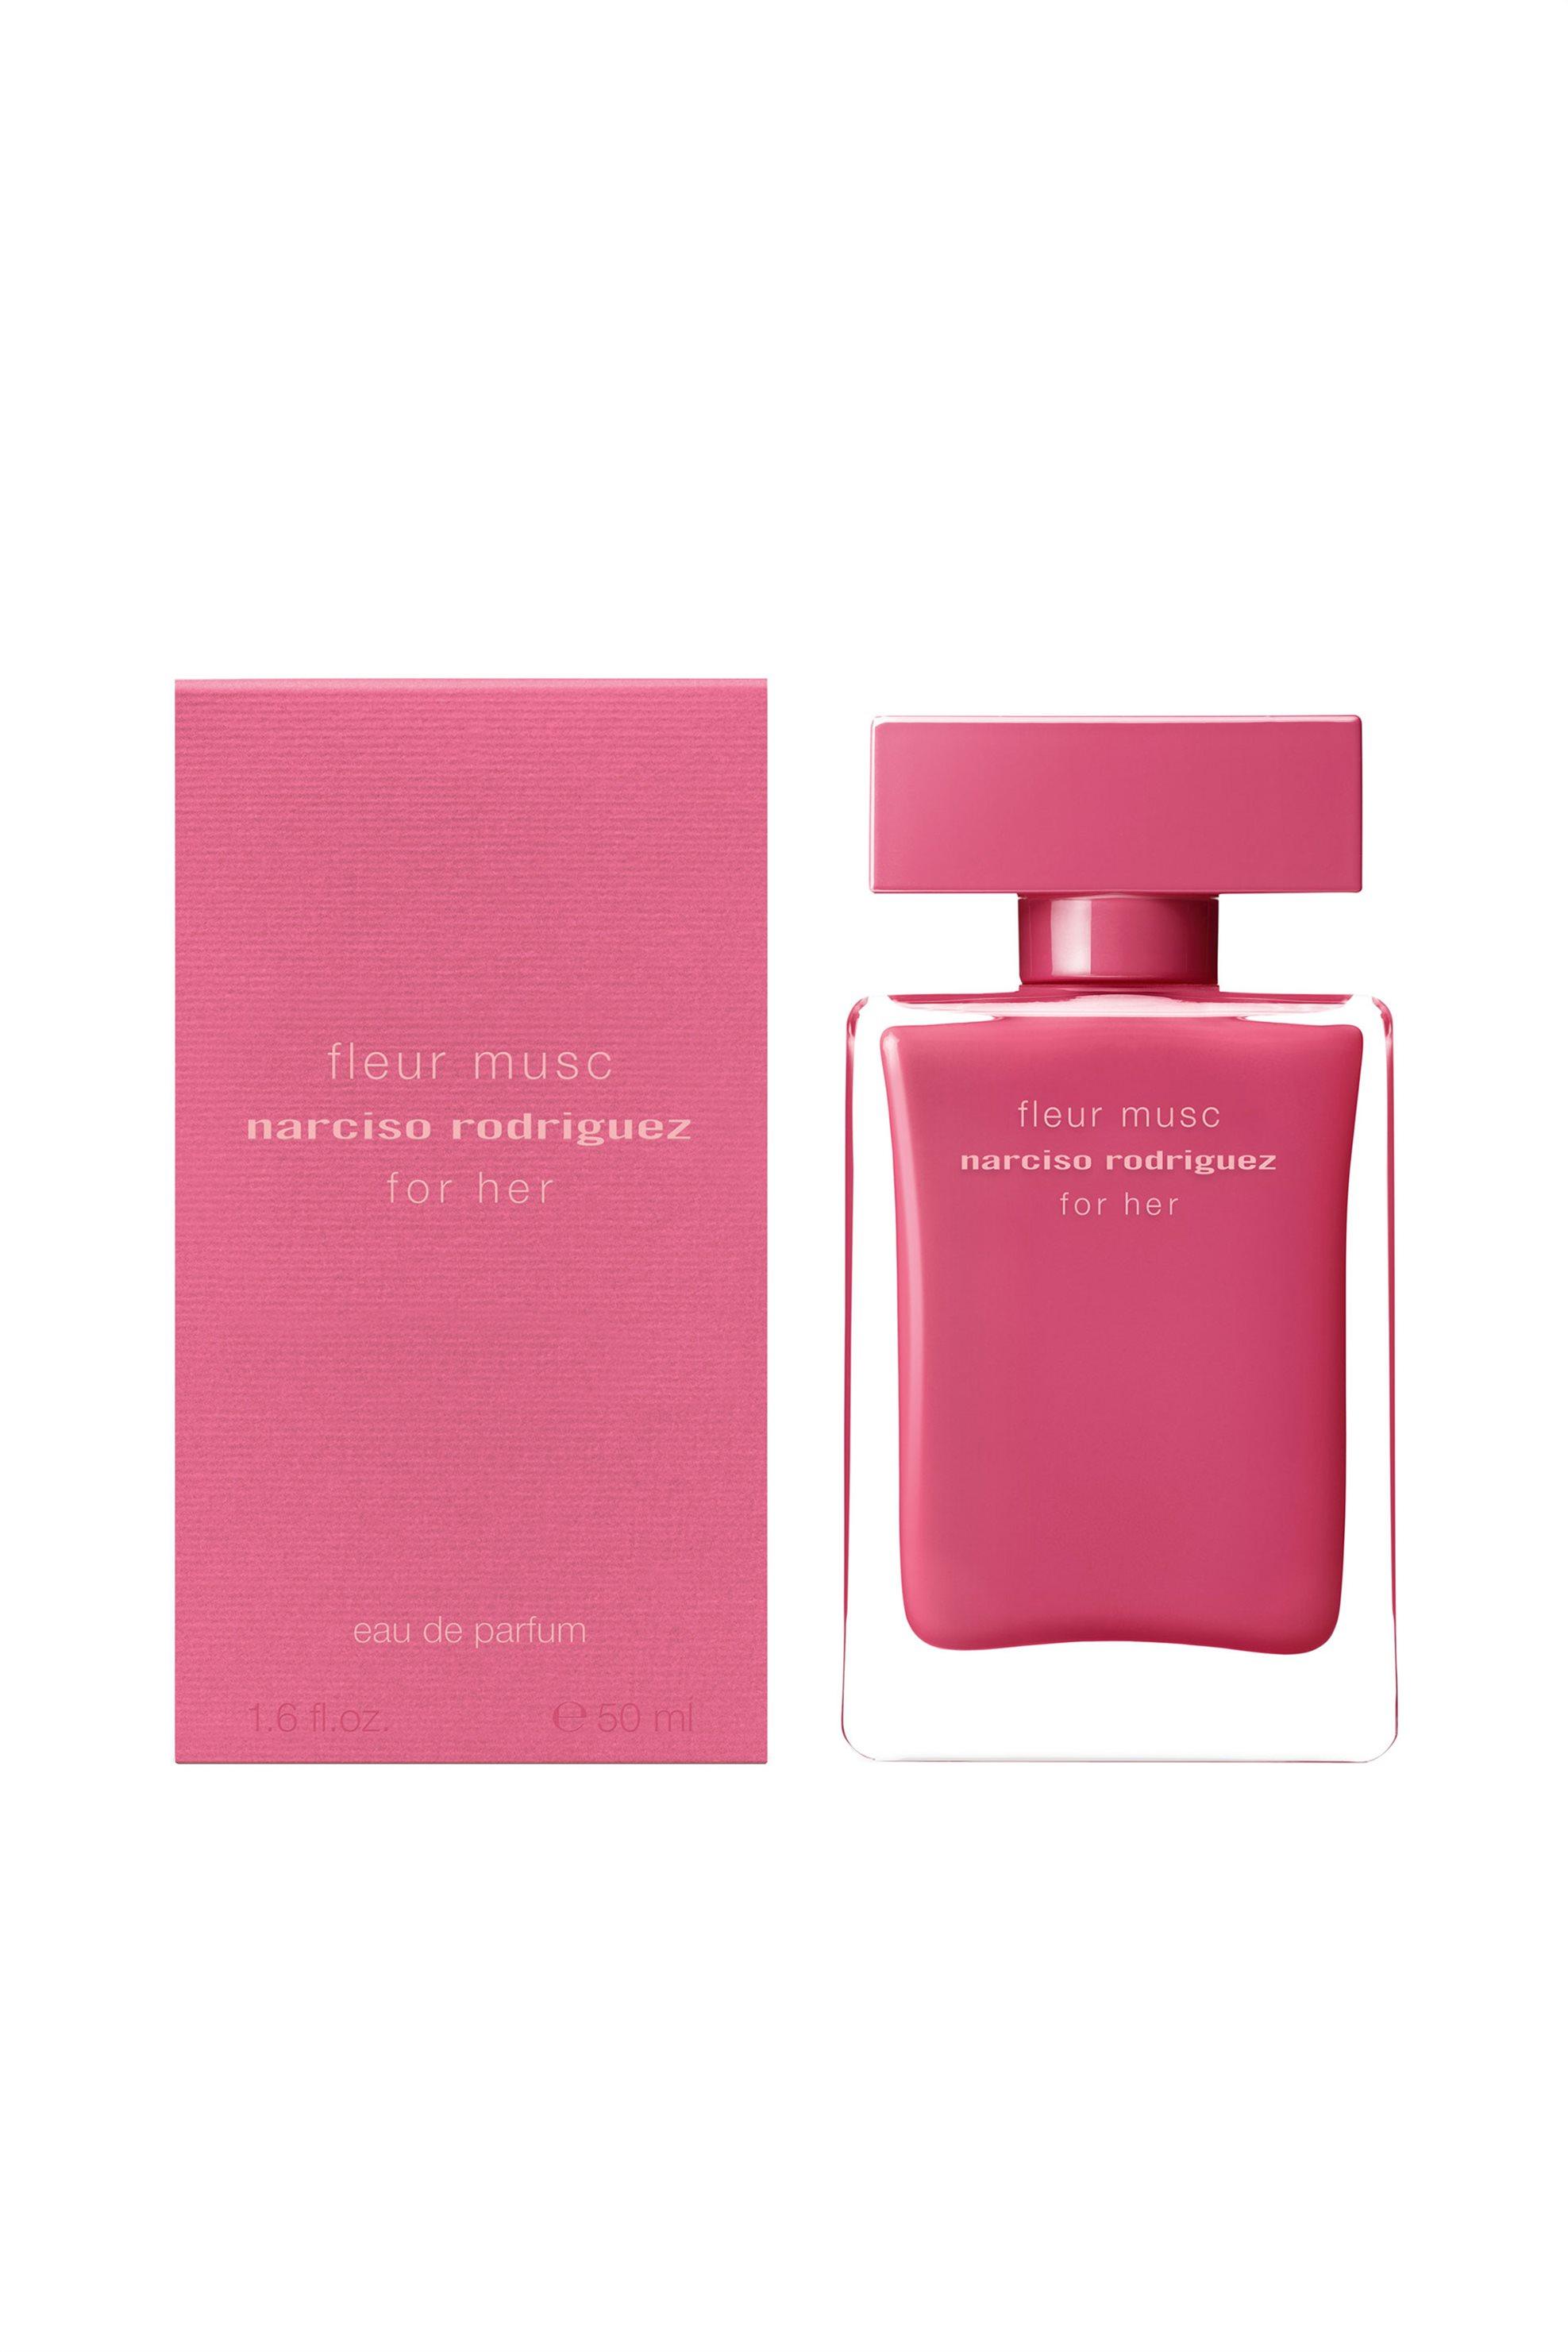 Narciso Rodriguez Narciso Rodriguez For Her Fleur Musc EdP 50 ml - 88186500000 ομορφια   καλλυντικα επιλεκτικησ   αρώματα   γυναικεία αρώματα   eau de parfum